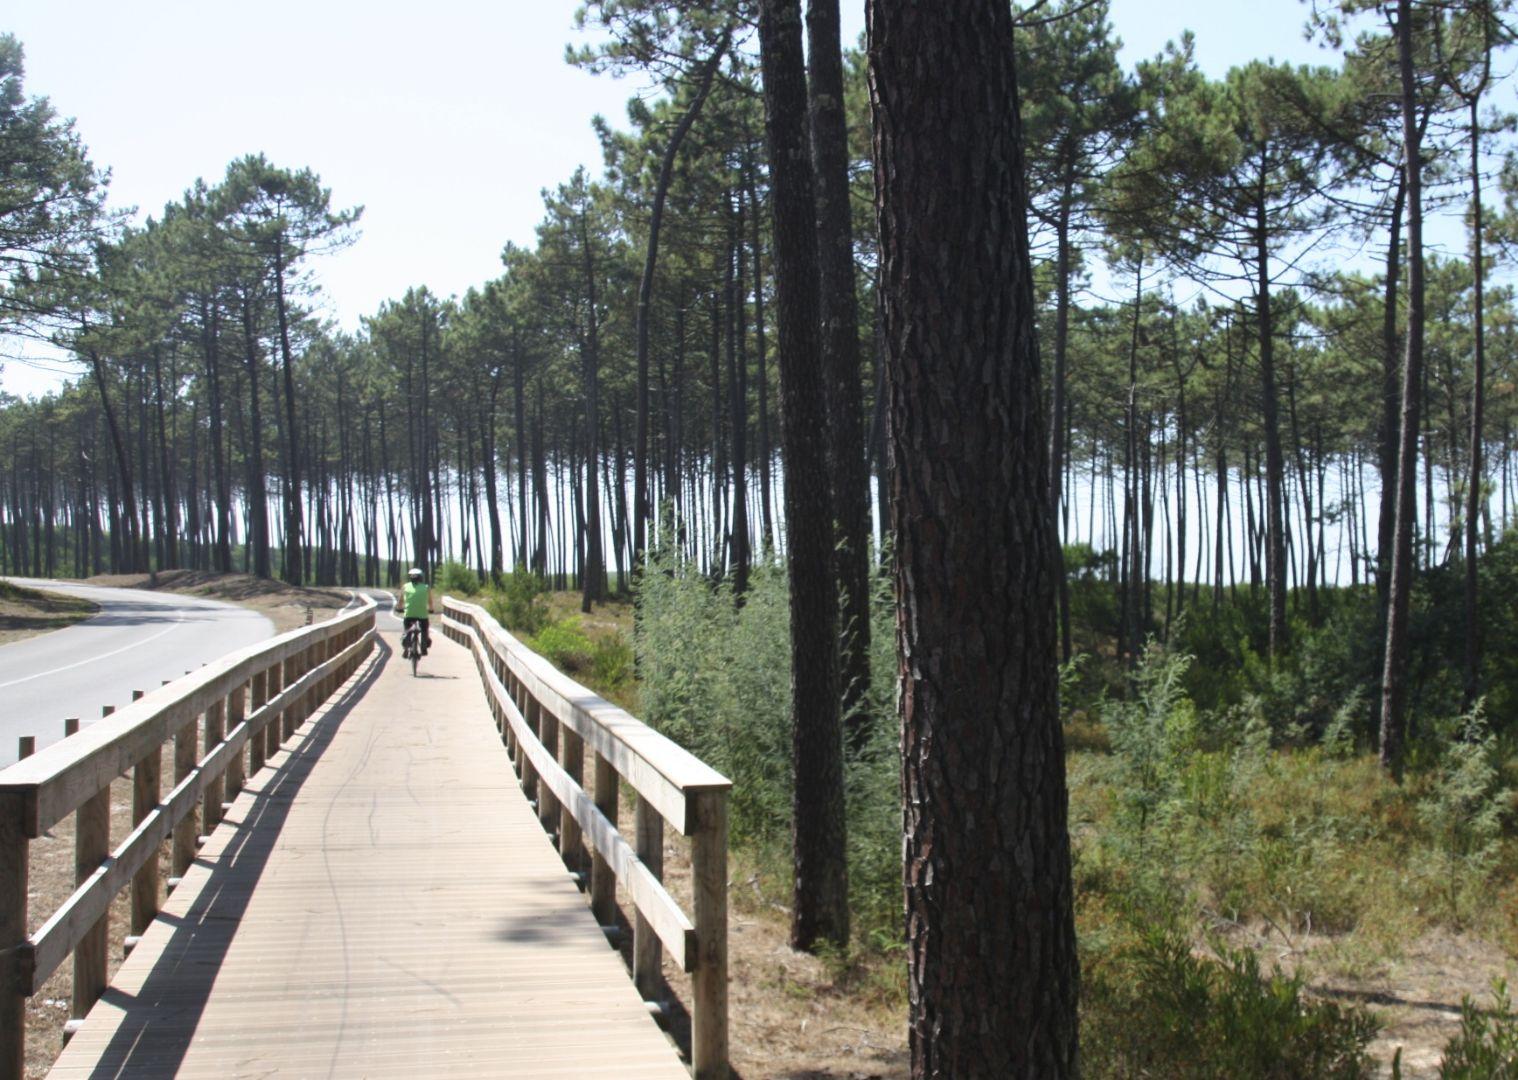 IMG_1019.jpg - Portugal - Azure Ocean Ride - Leisure Cycling